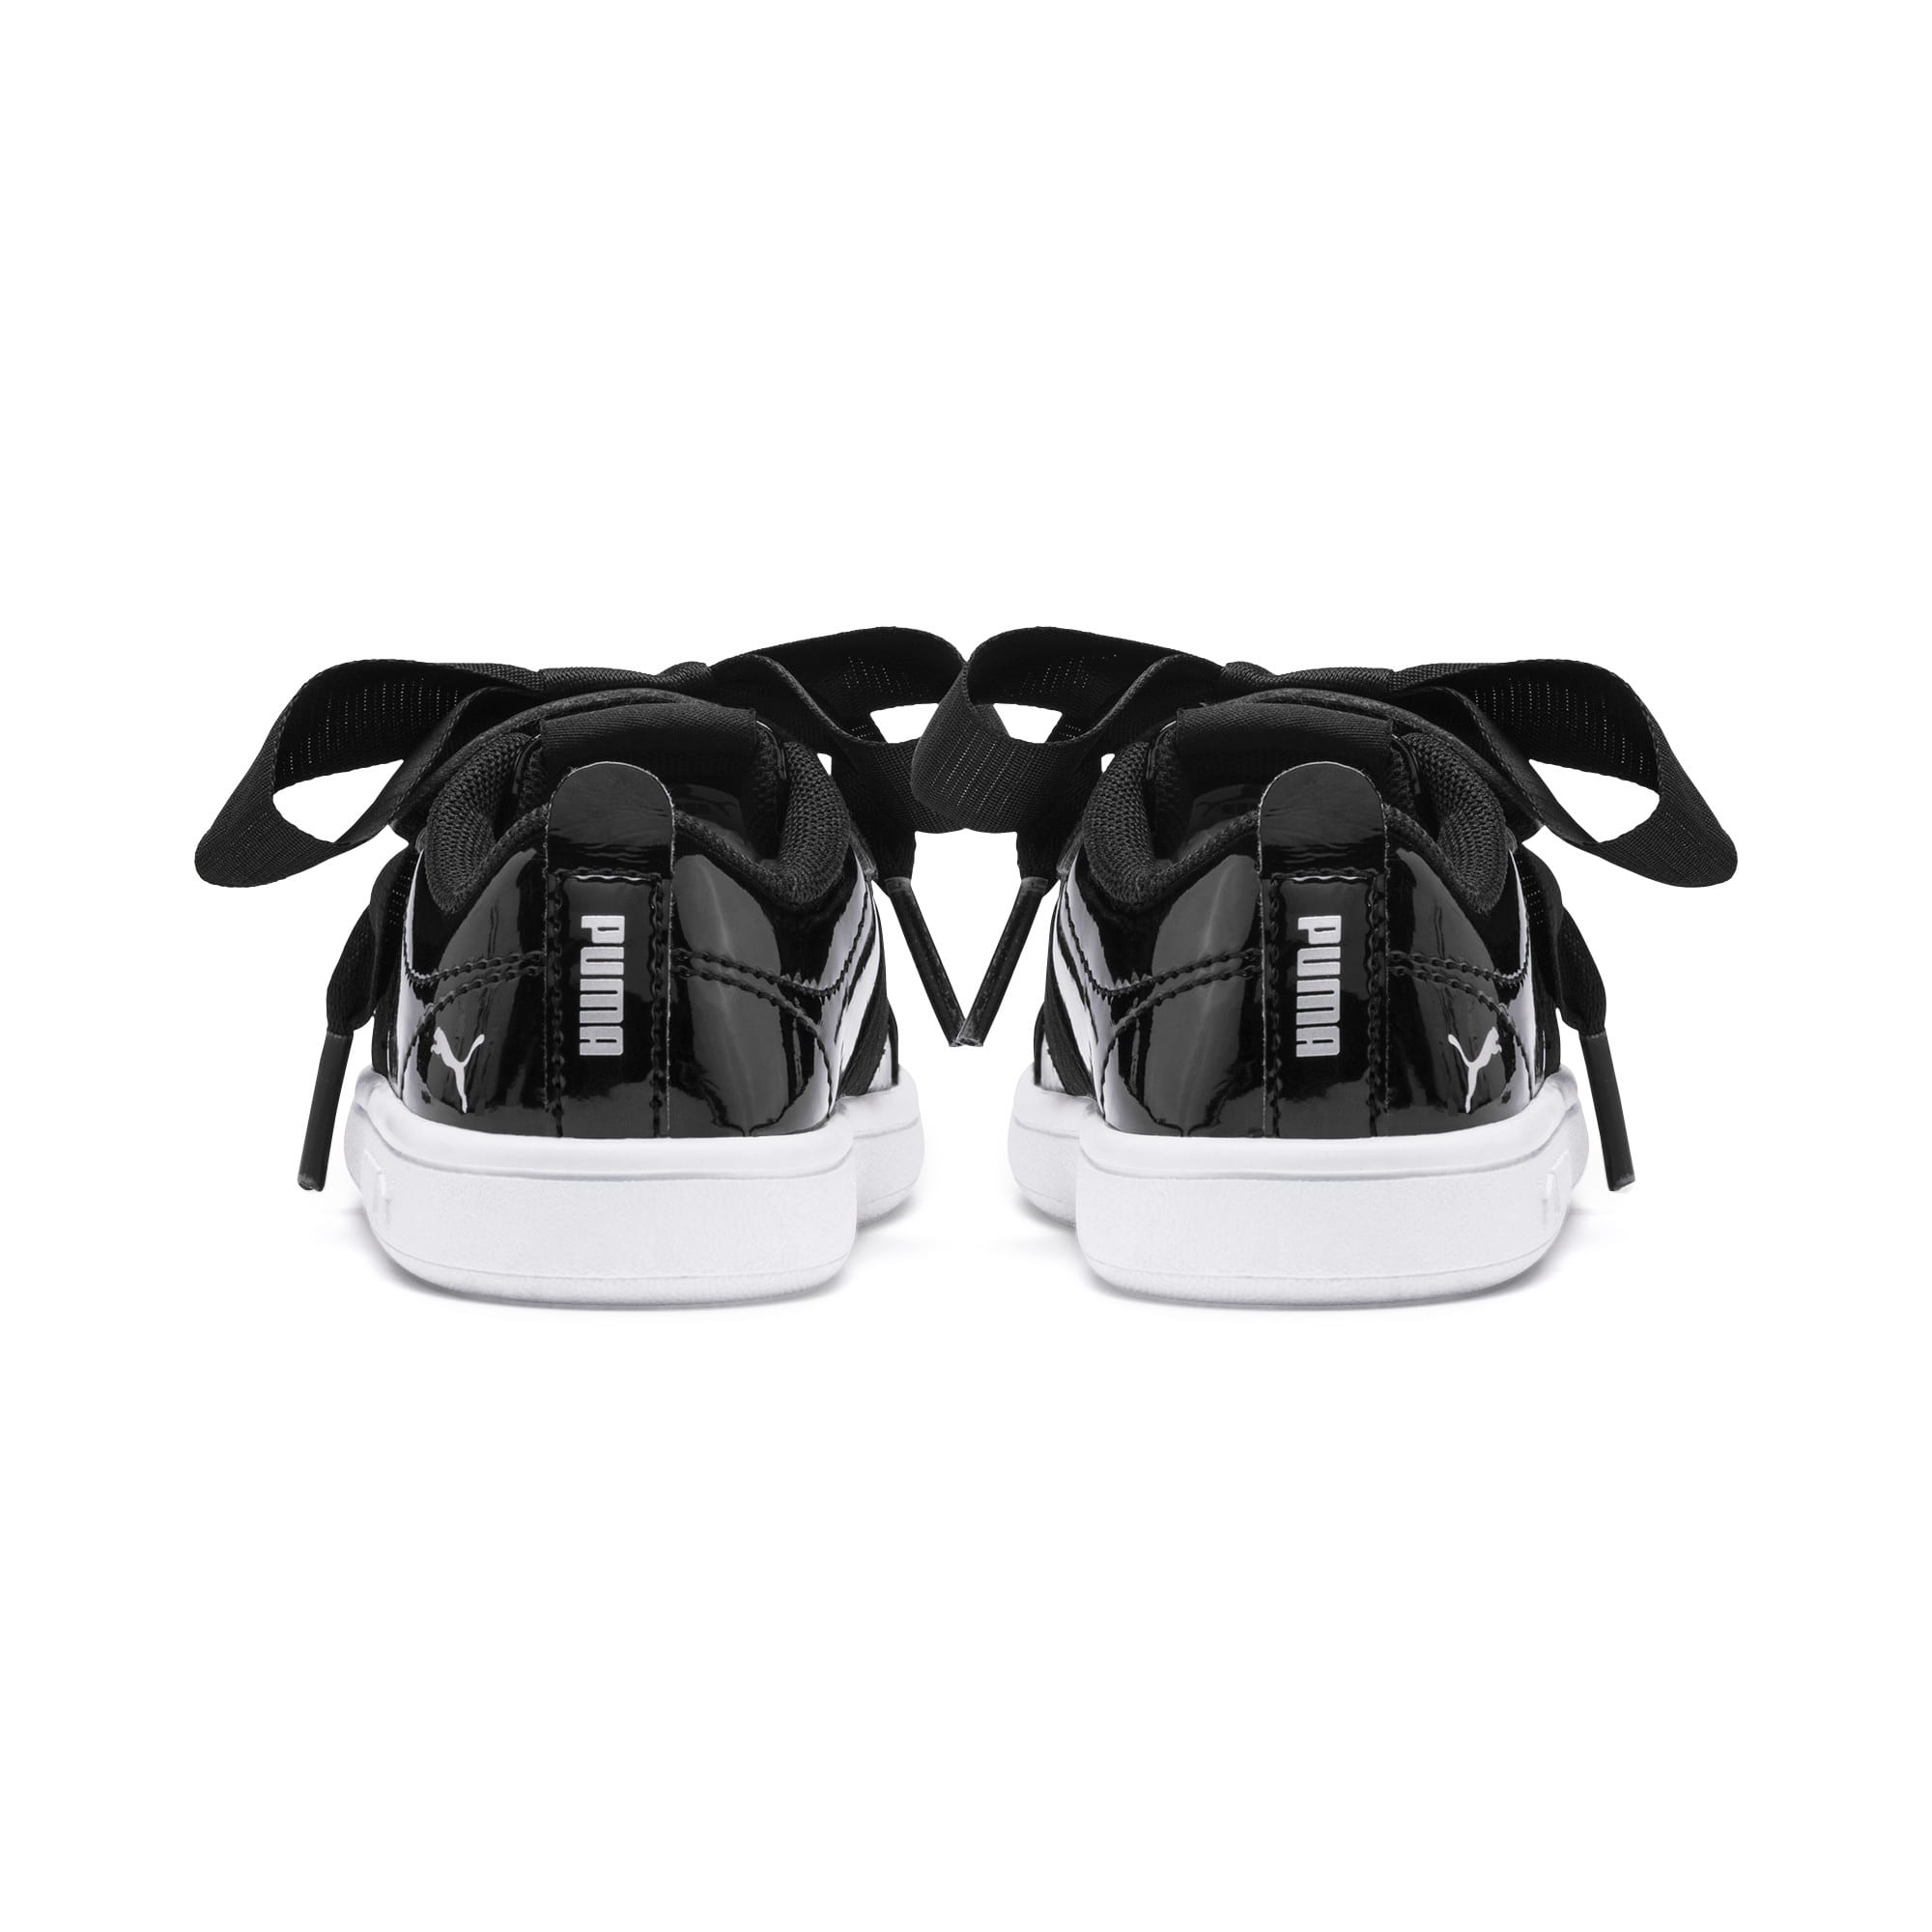 Thumbnail 3 of PUMA Smash v2 Patent Buckle AC Toddler Shoes, Puma Black-Puma Silver-White, medium